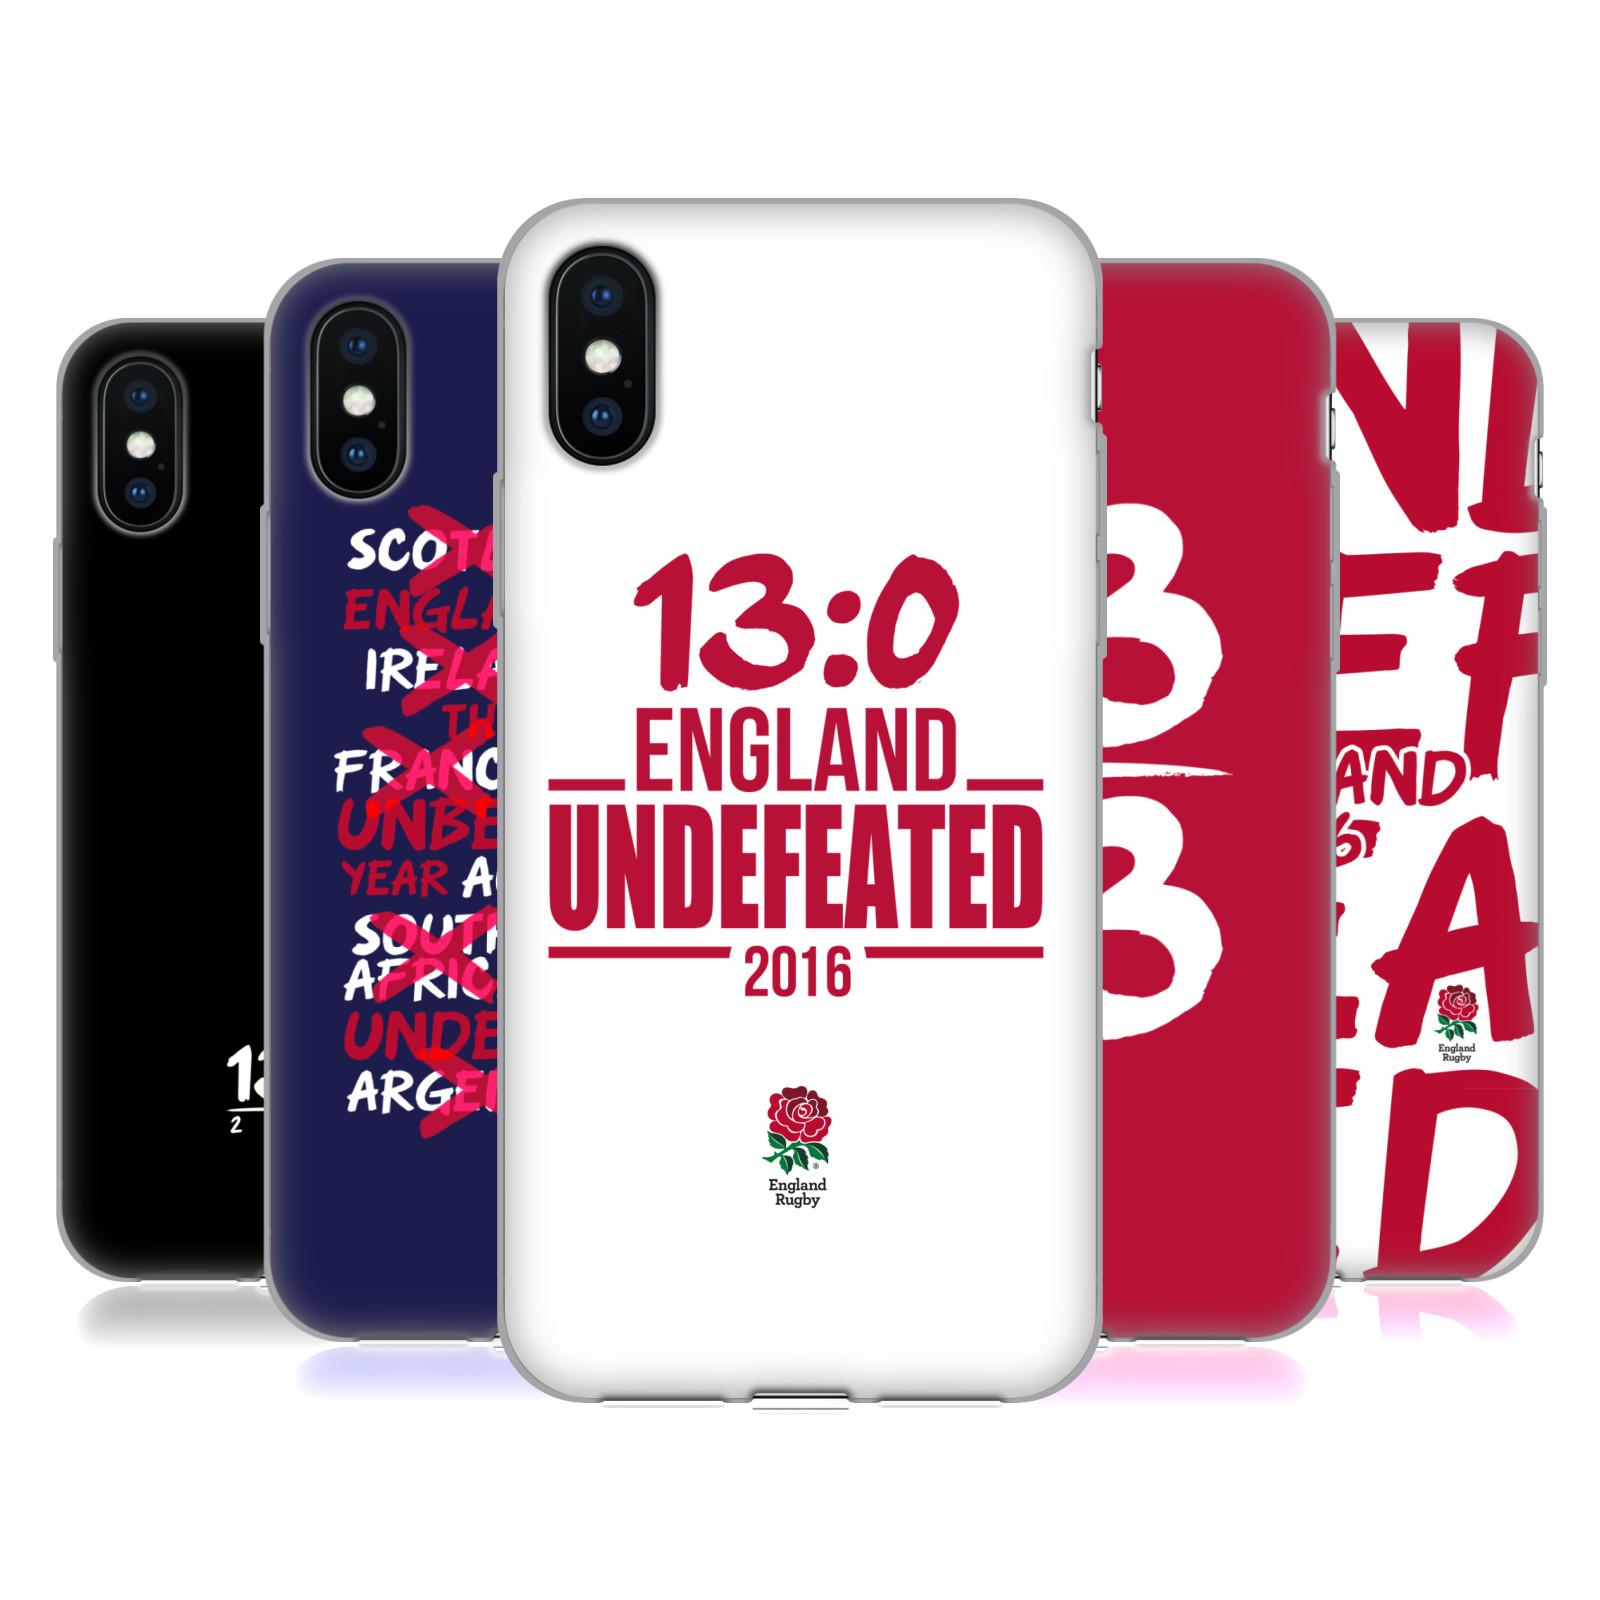 England Rugby Union <!--translate-lineup-->2016 Unbeaten<!--translate-lineup-->